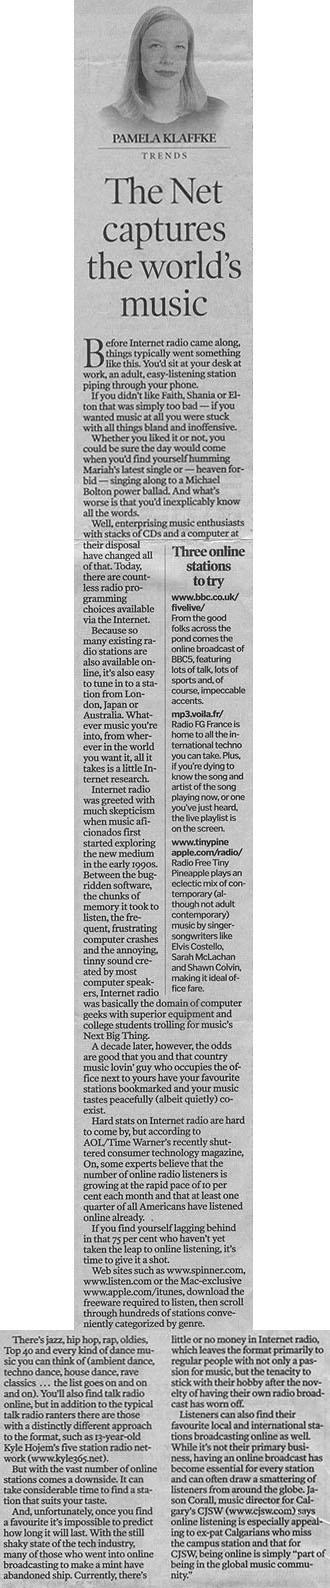 Calgary Herald Article